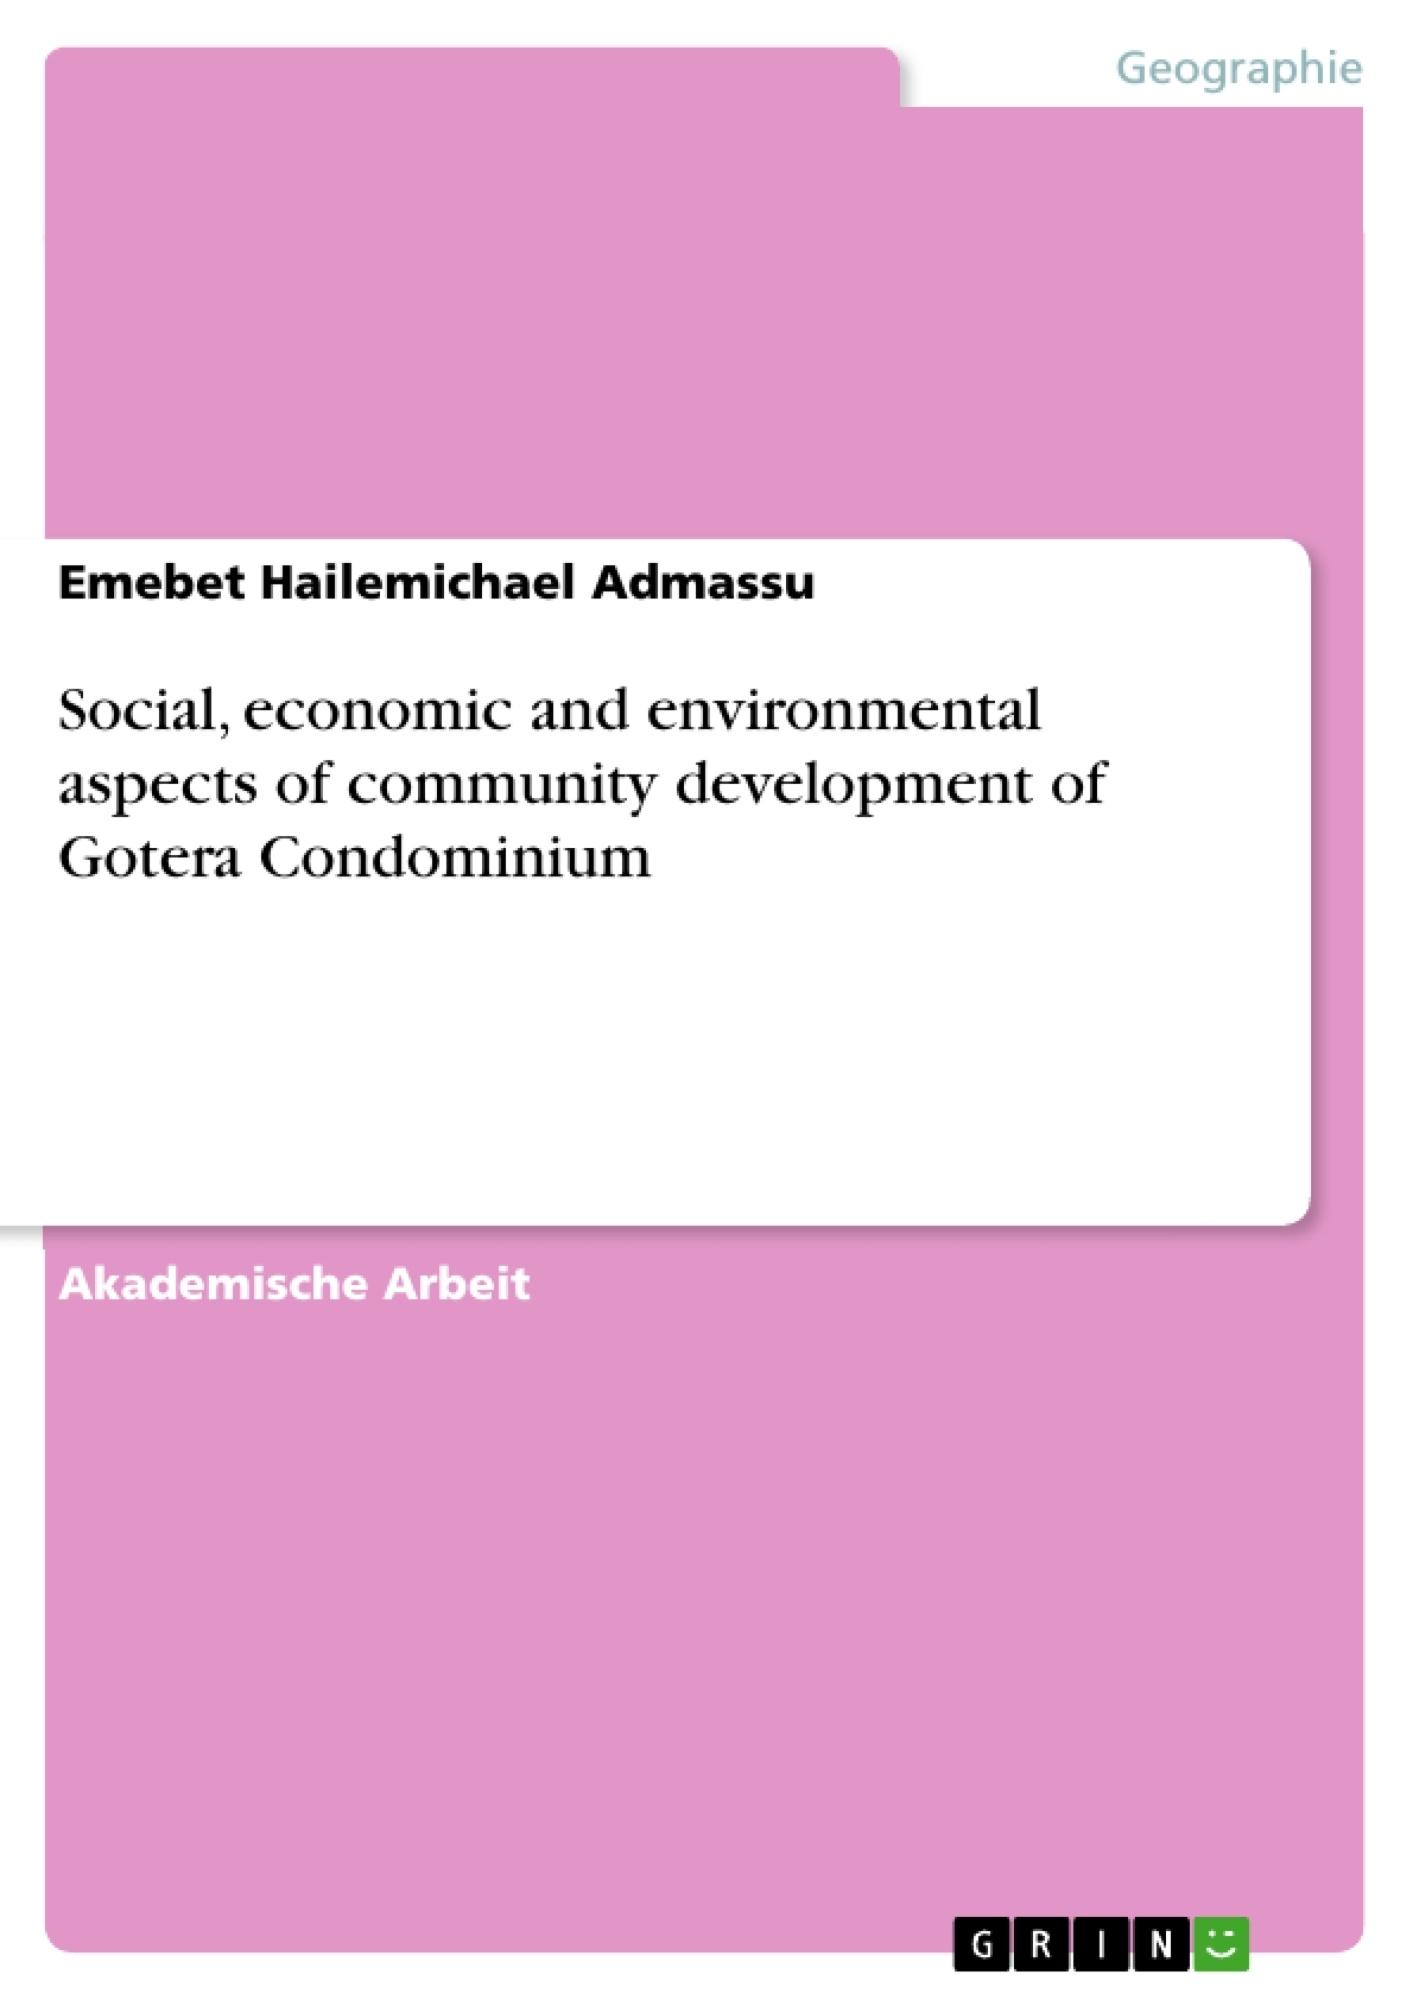 Titel: Social, economic and environmental aspects of community development of Gotera Condominium